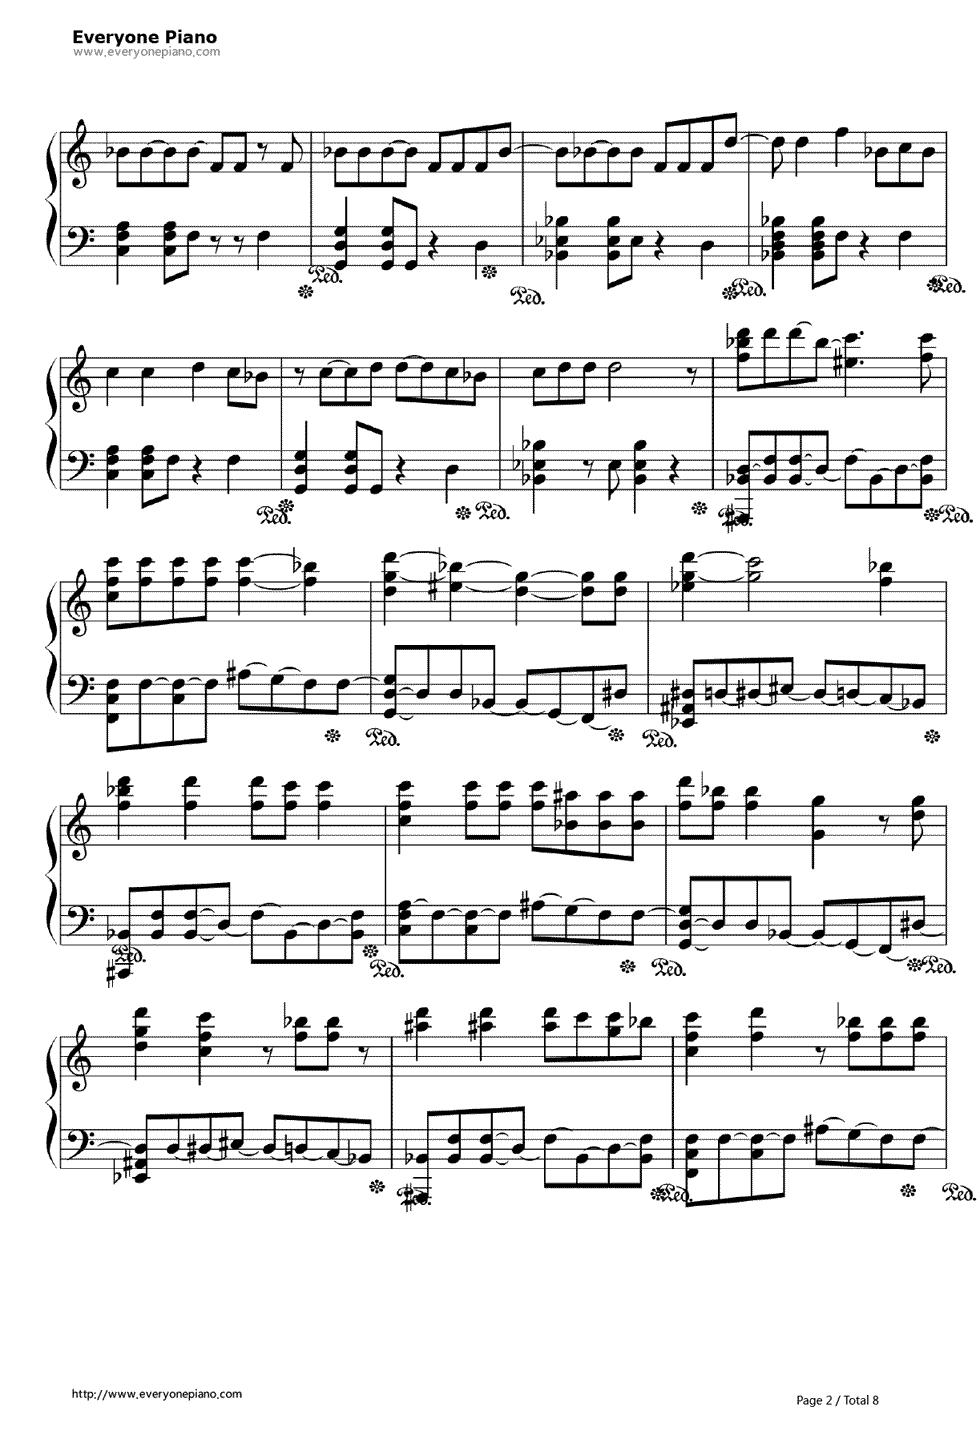 Cruise Florida Georgia Line Stave Preview 2 Free Piano